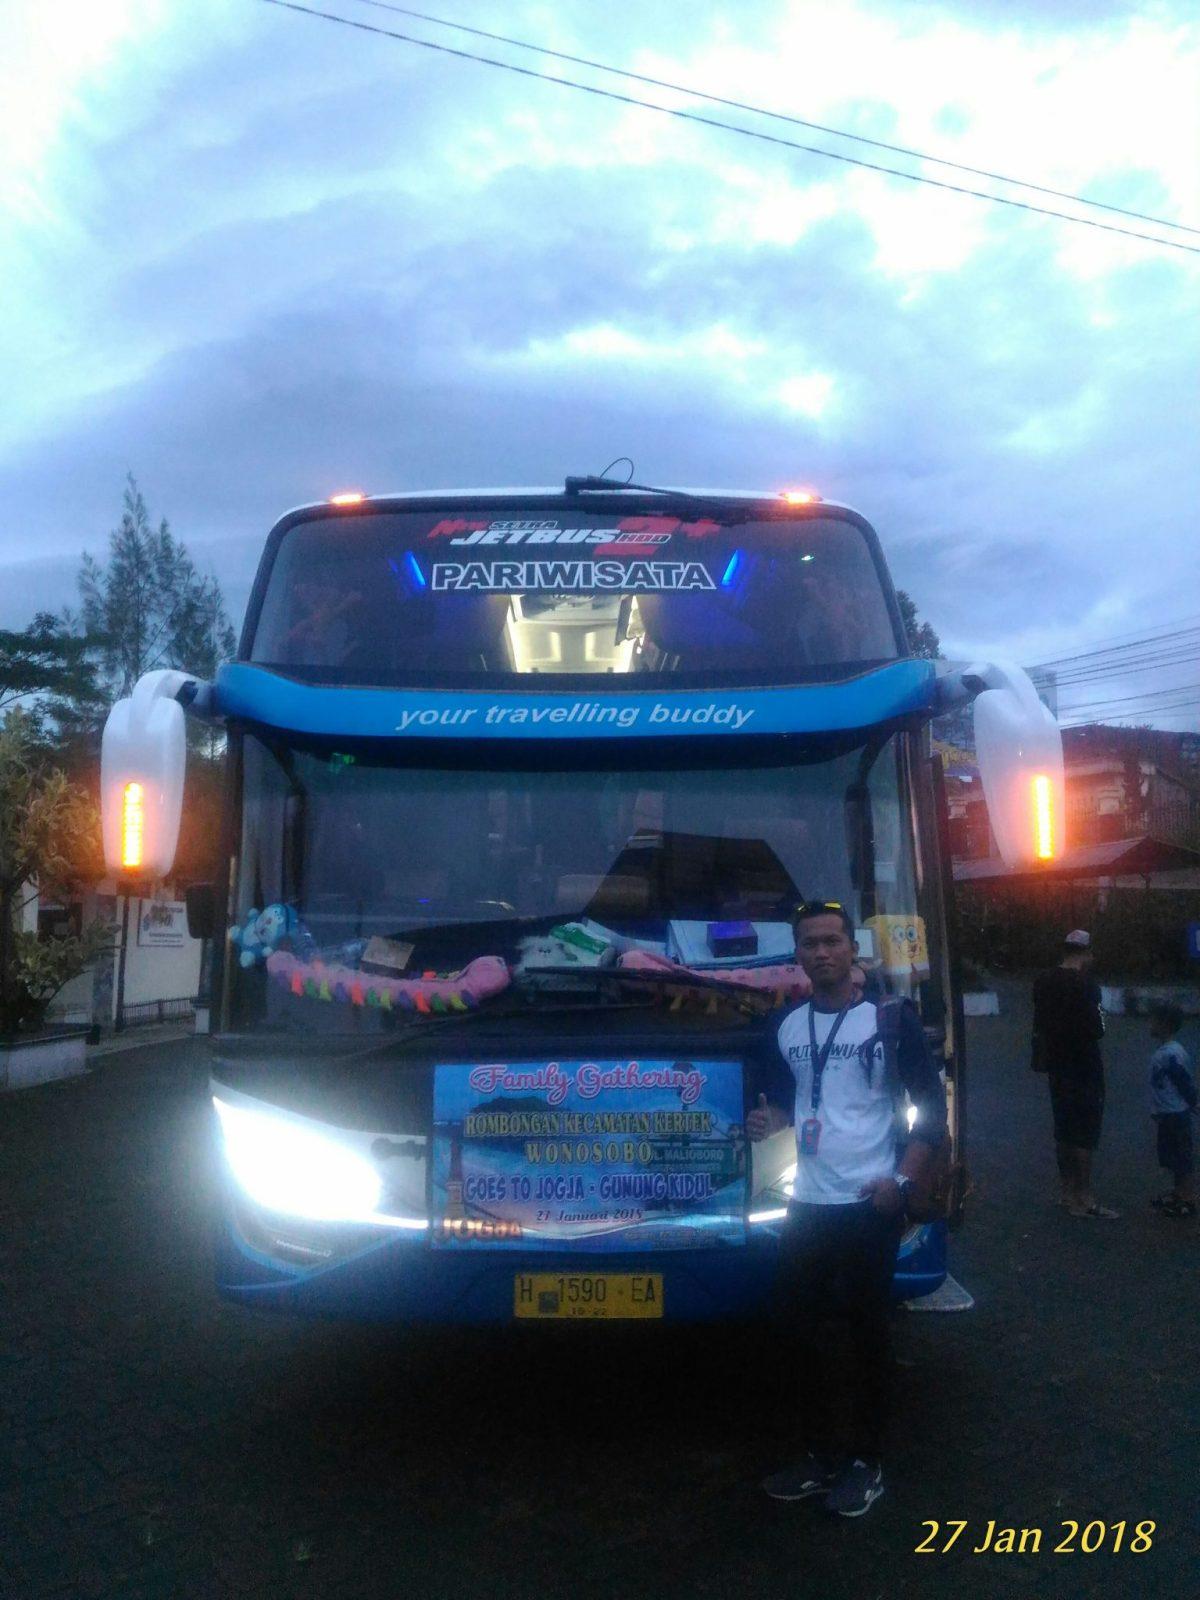 Sewa Bus Pariwisata TRANS JAYA di area Wonosobo - Temanggung - Magelang - Jogja - Klaten - Solo - Purworejo - Kebumen - Banjarnegara - Purbalingga - Purwokerto - Banyumas - Jatilawang - Ajibarang - Lumbir - Wangon - Cilacap